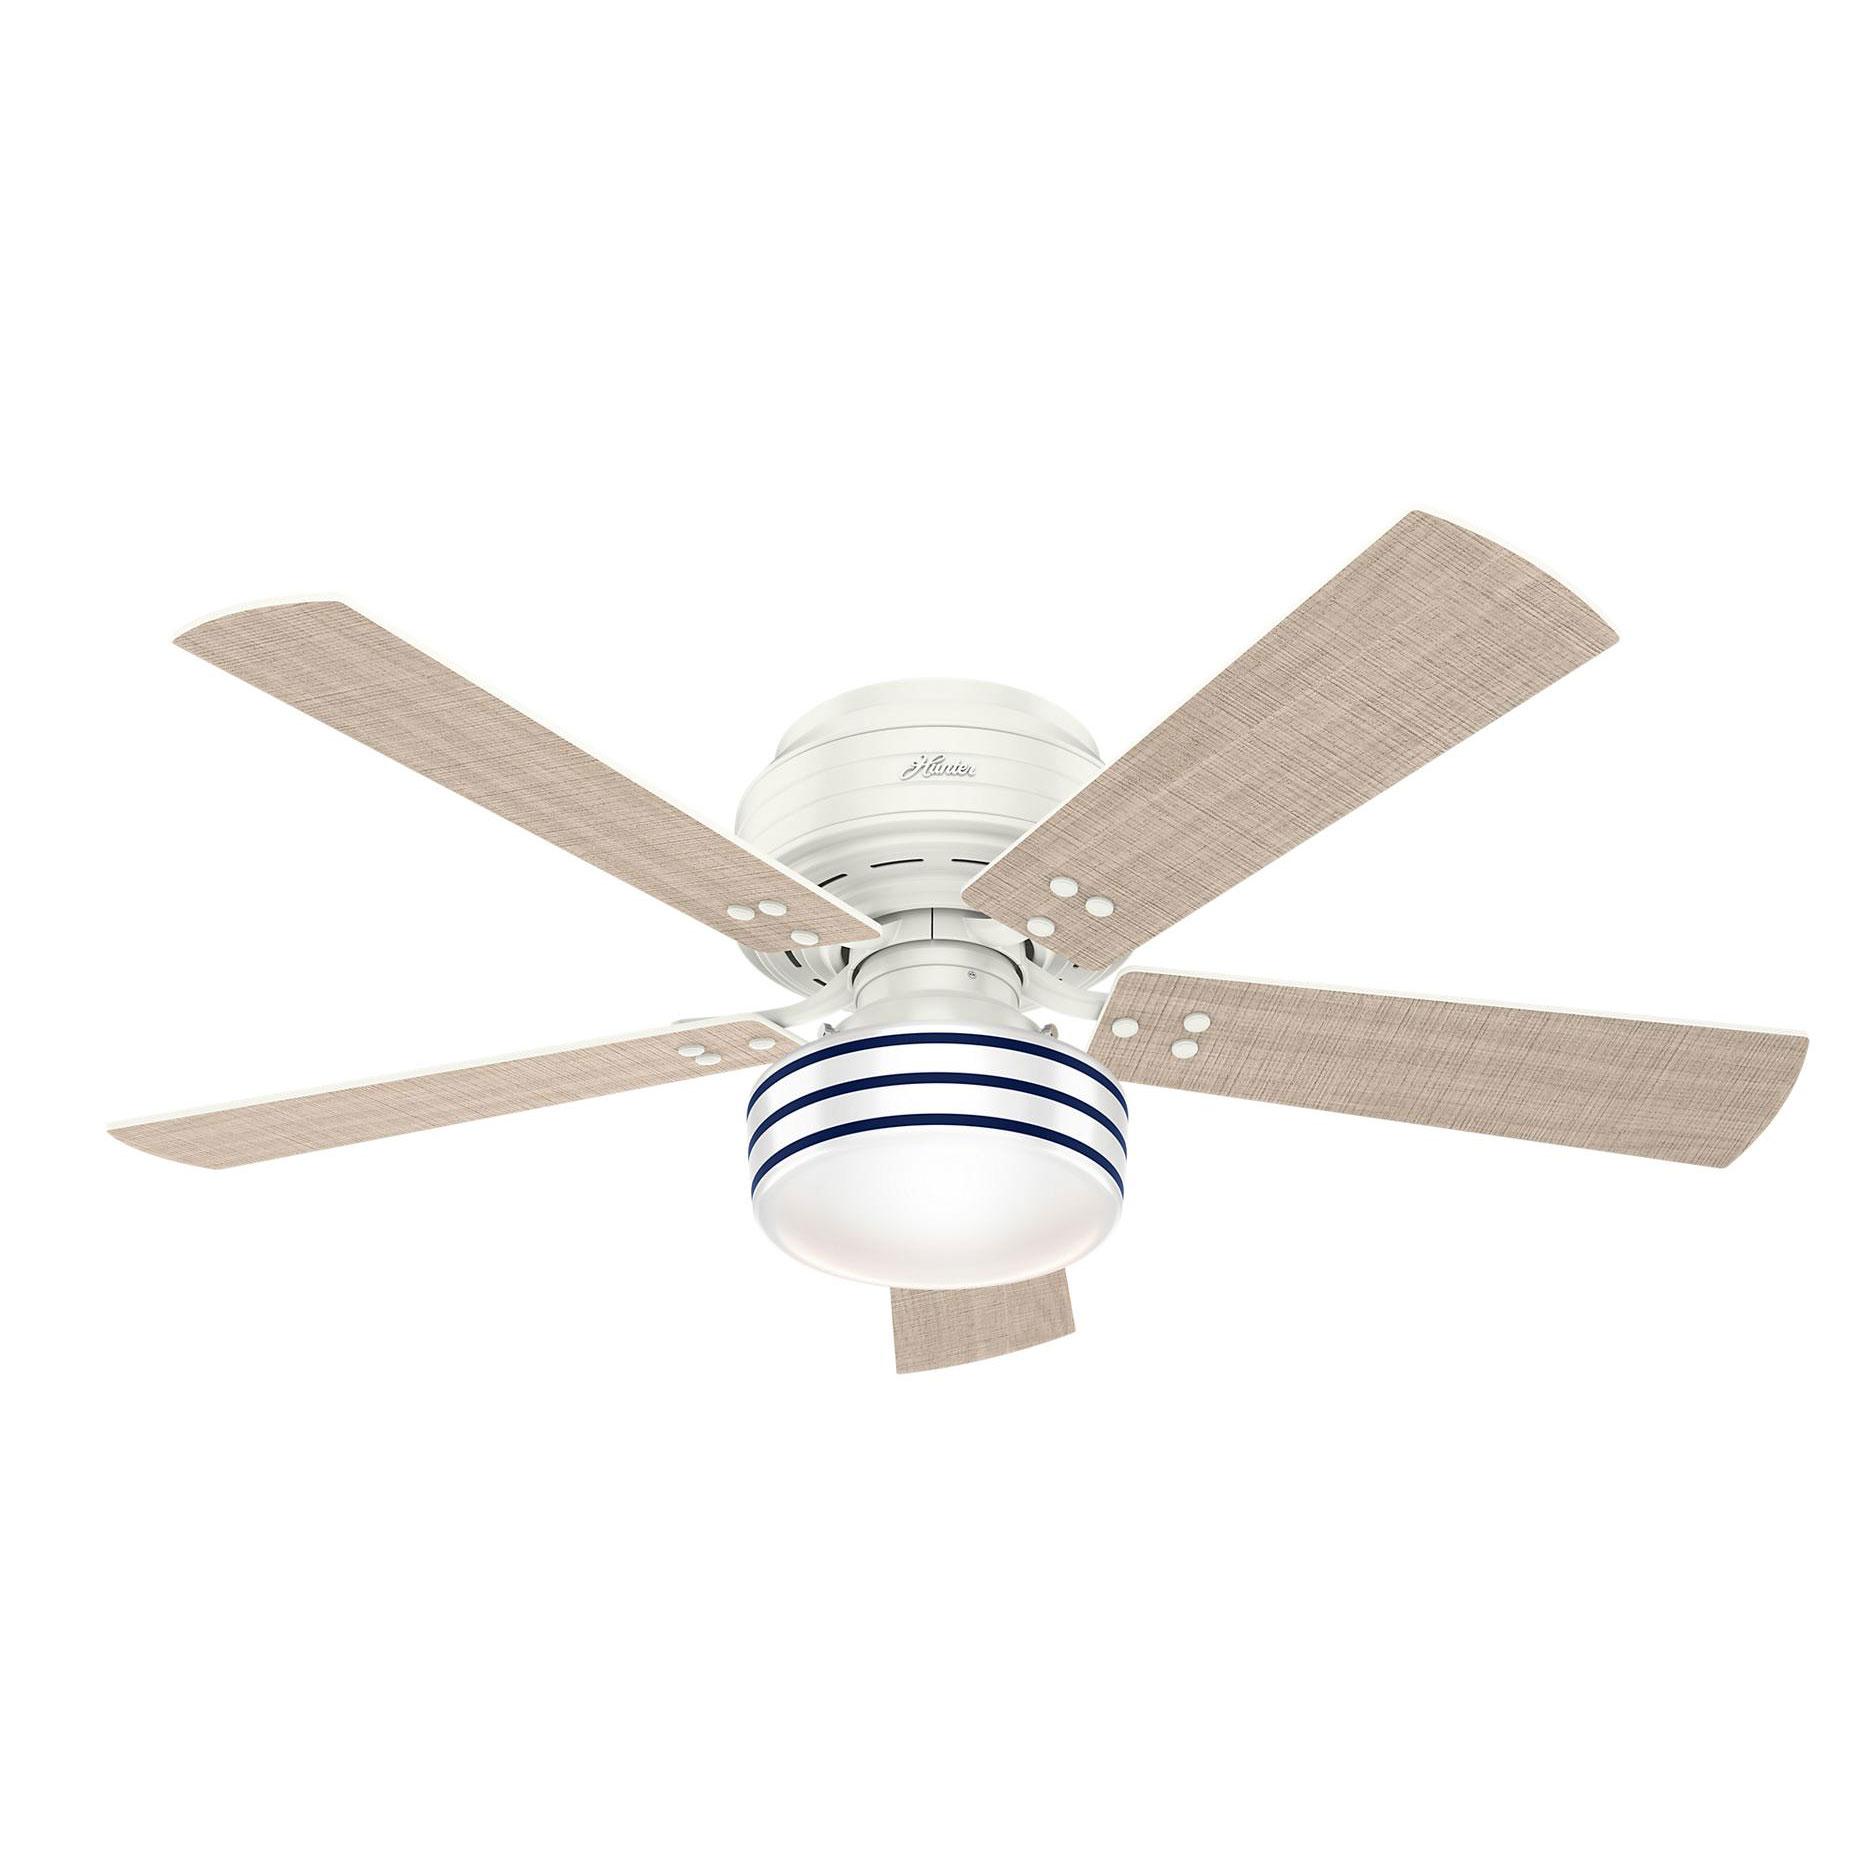 Cedar Key Low Profile Indoor Outdoor Ceiling Fan With Light By Hunter